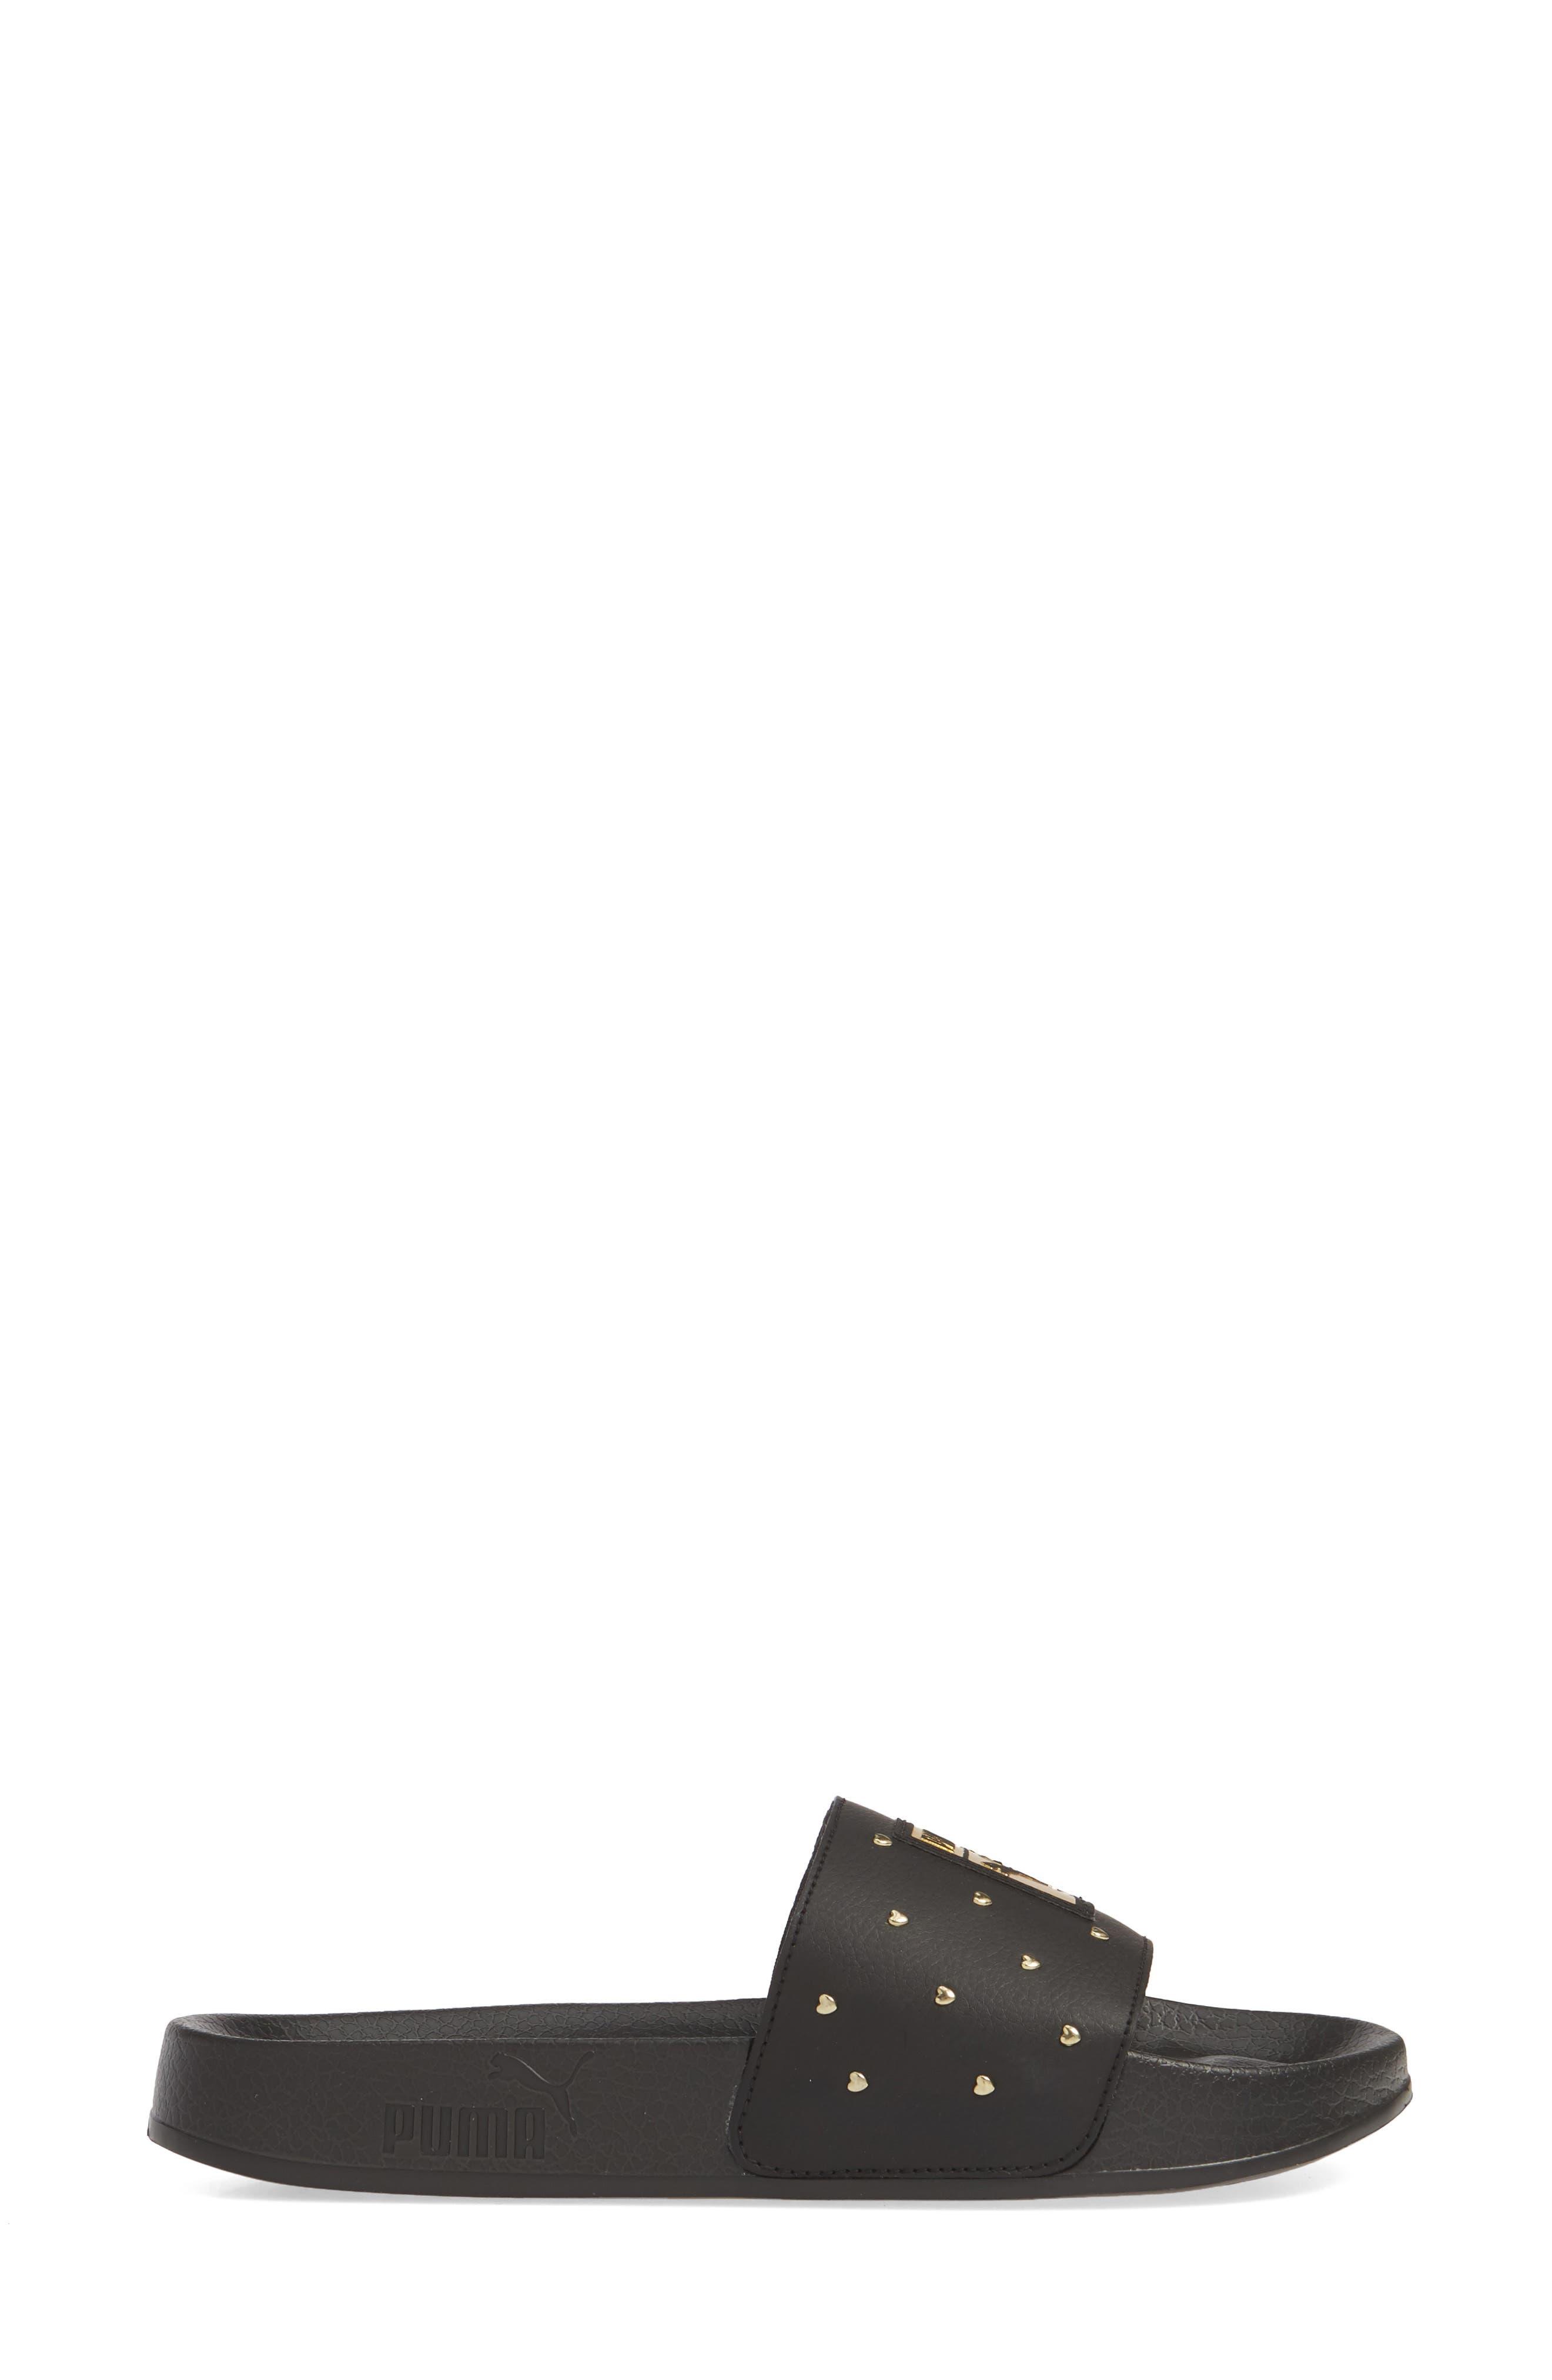 PUMA, Leadcat Studs Sport Slide, Alternate thumbnail 3, color, BLACK/ TEAM GOLD